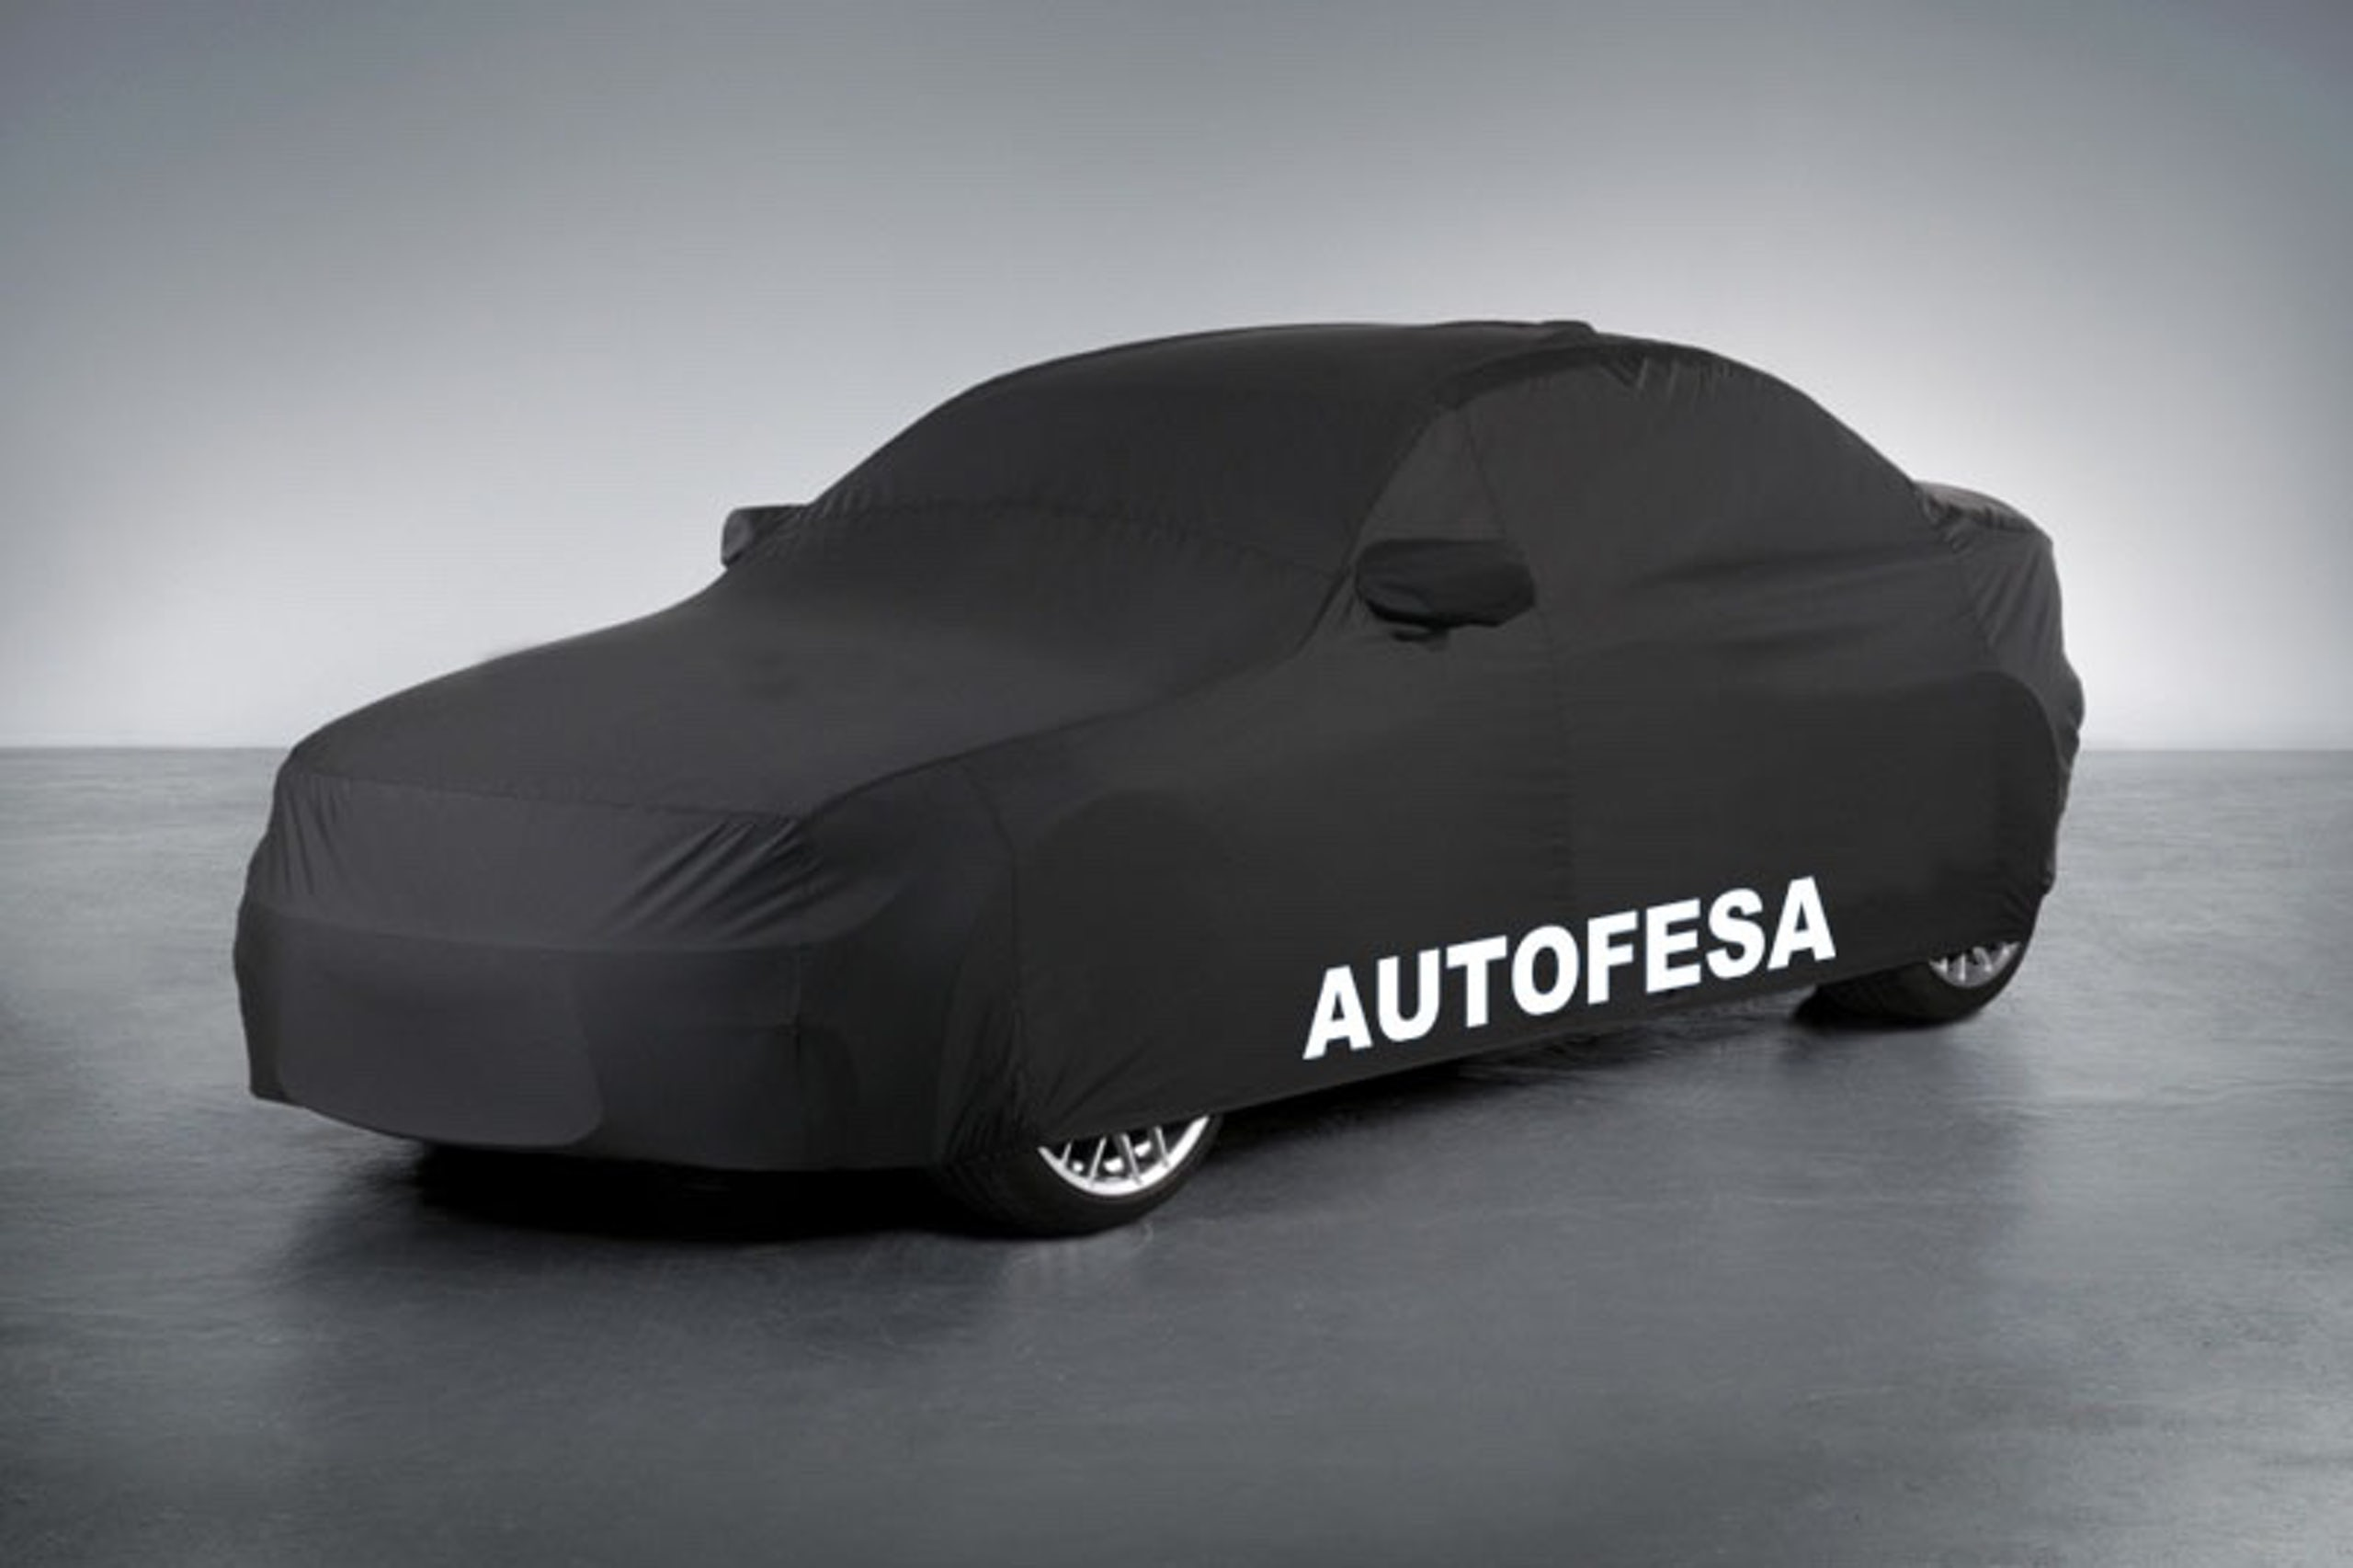 Jeep Renegade 2.0 MJet 140cv Longitude 4x4 AD 5p S/S - Foto 22